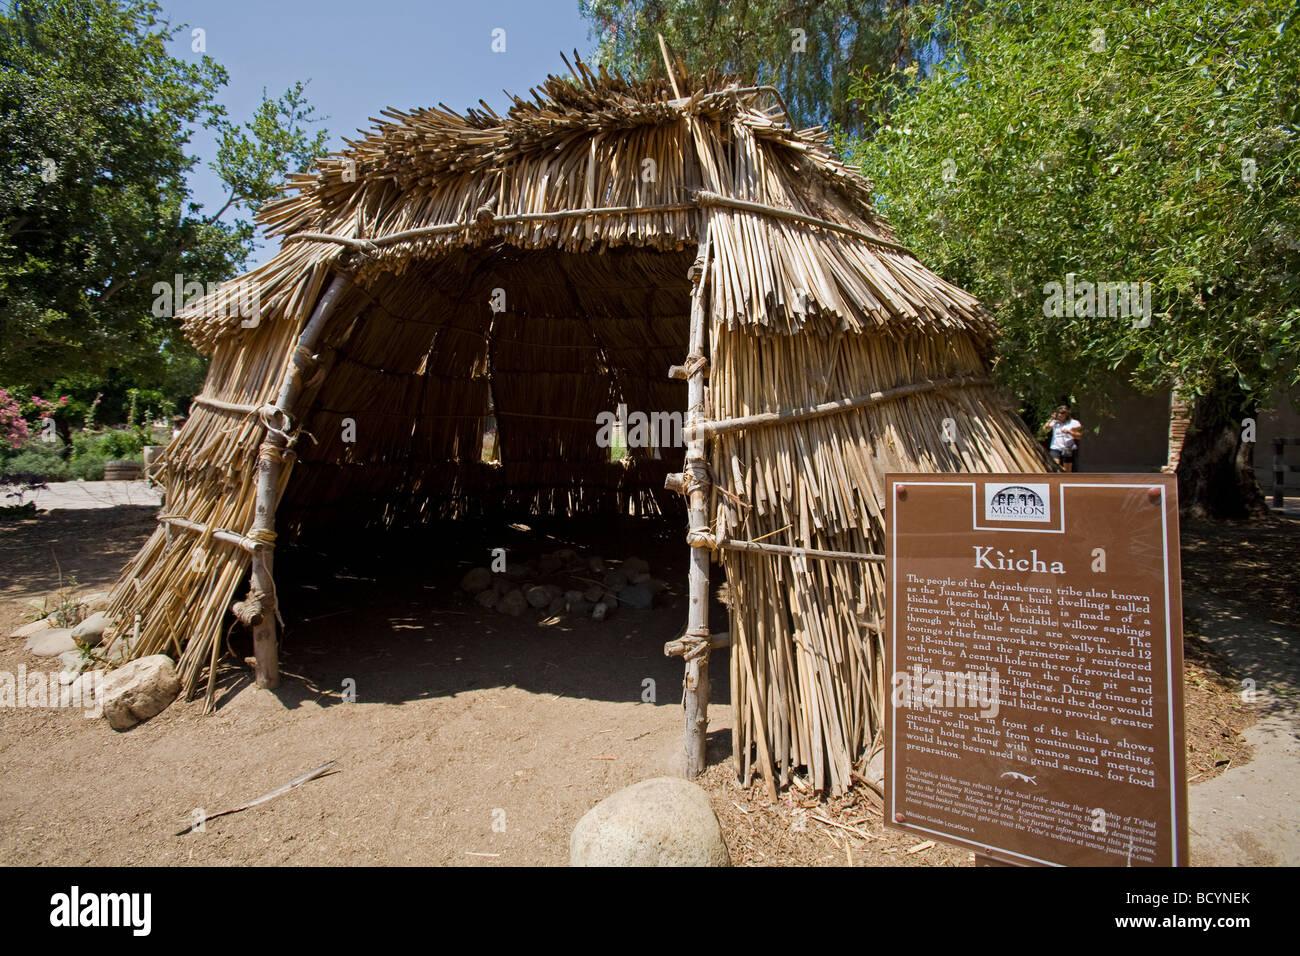 Kiicha - Native American Shelter, Mission San Juan Capistrano ...